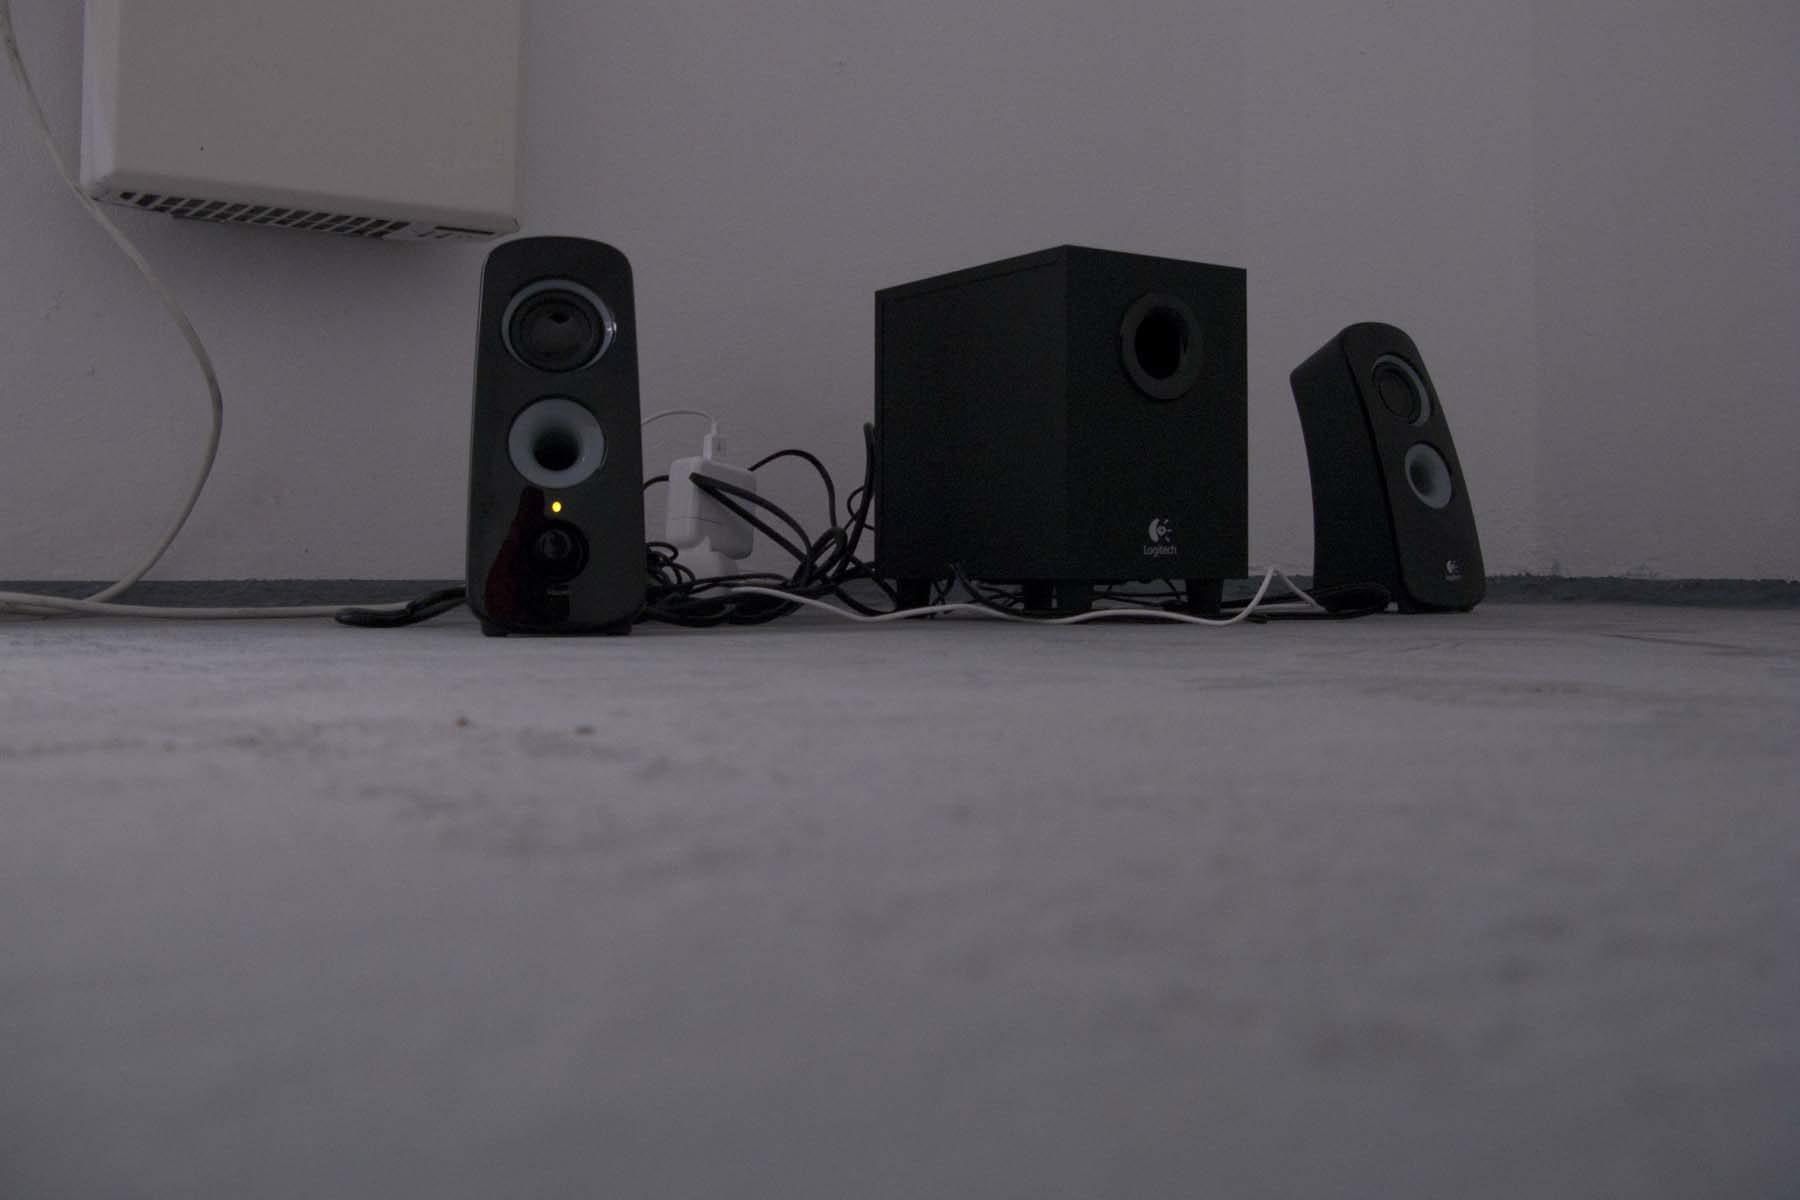 N. Cvijanović, Chronos devouring one of his children, 2010, loudspeaker, sound, 6'07'', loop